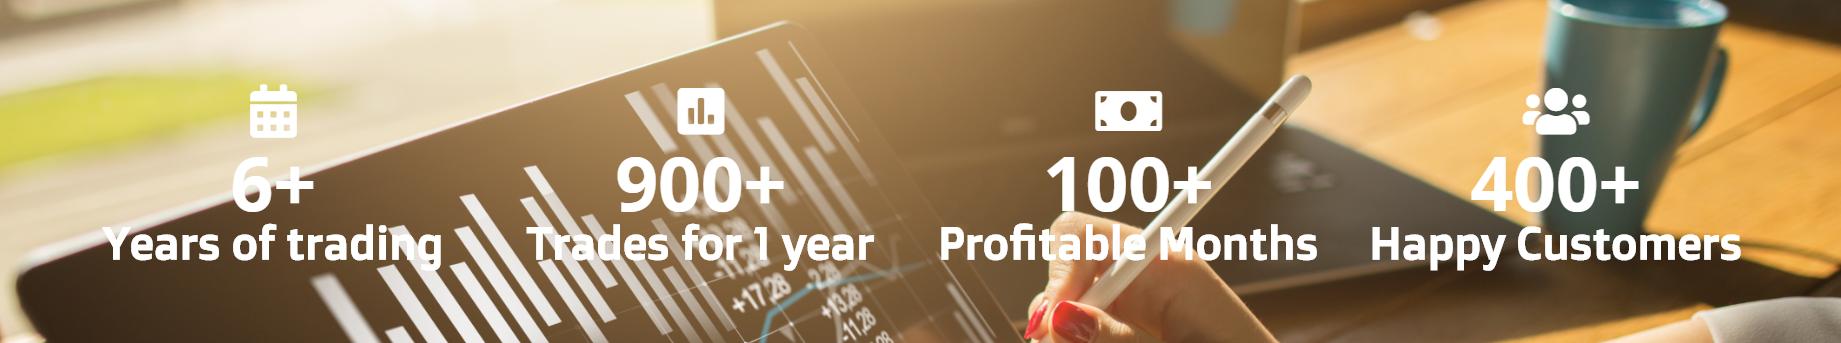 FX Price Signals presentation